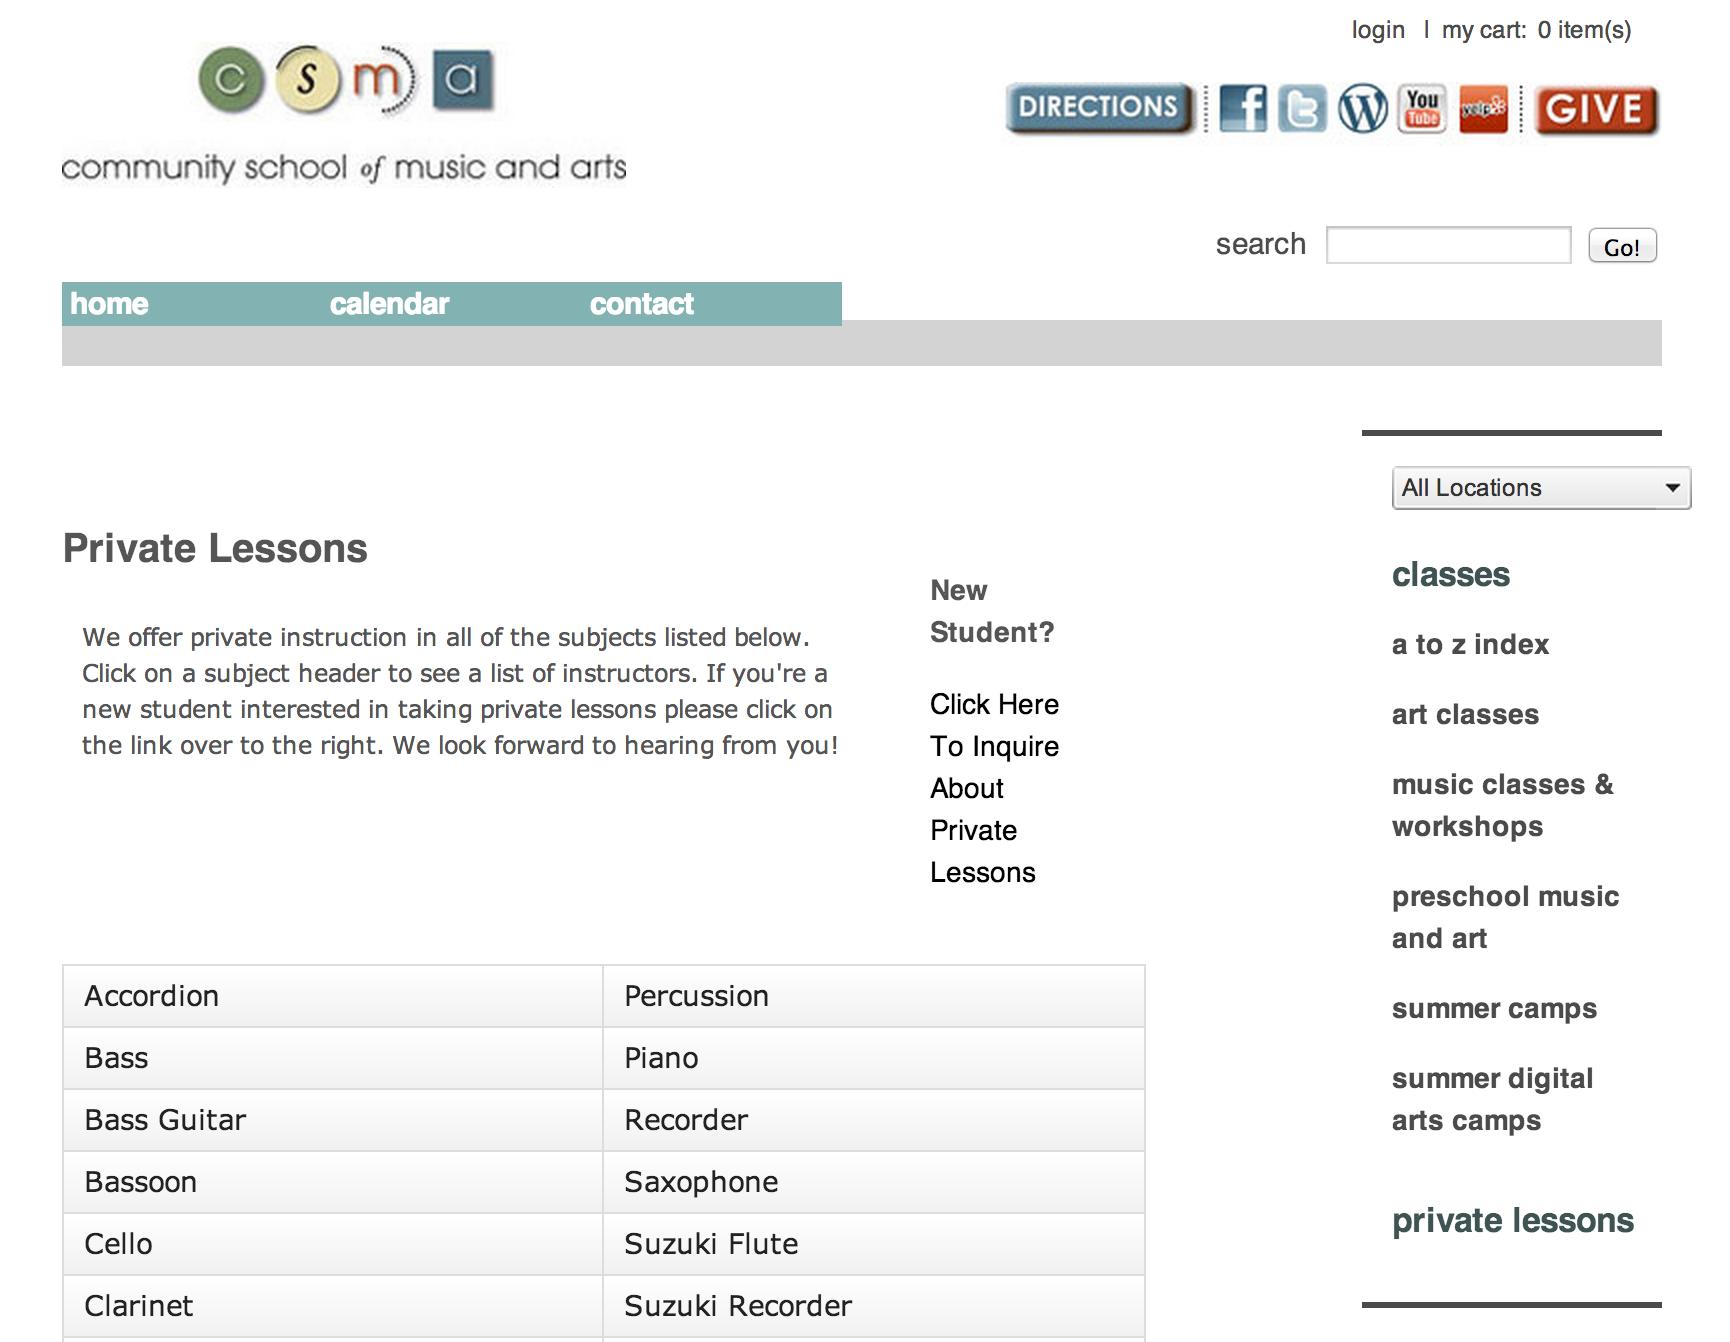 Community Education Image for Blog